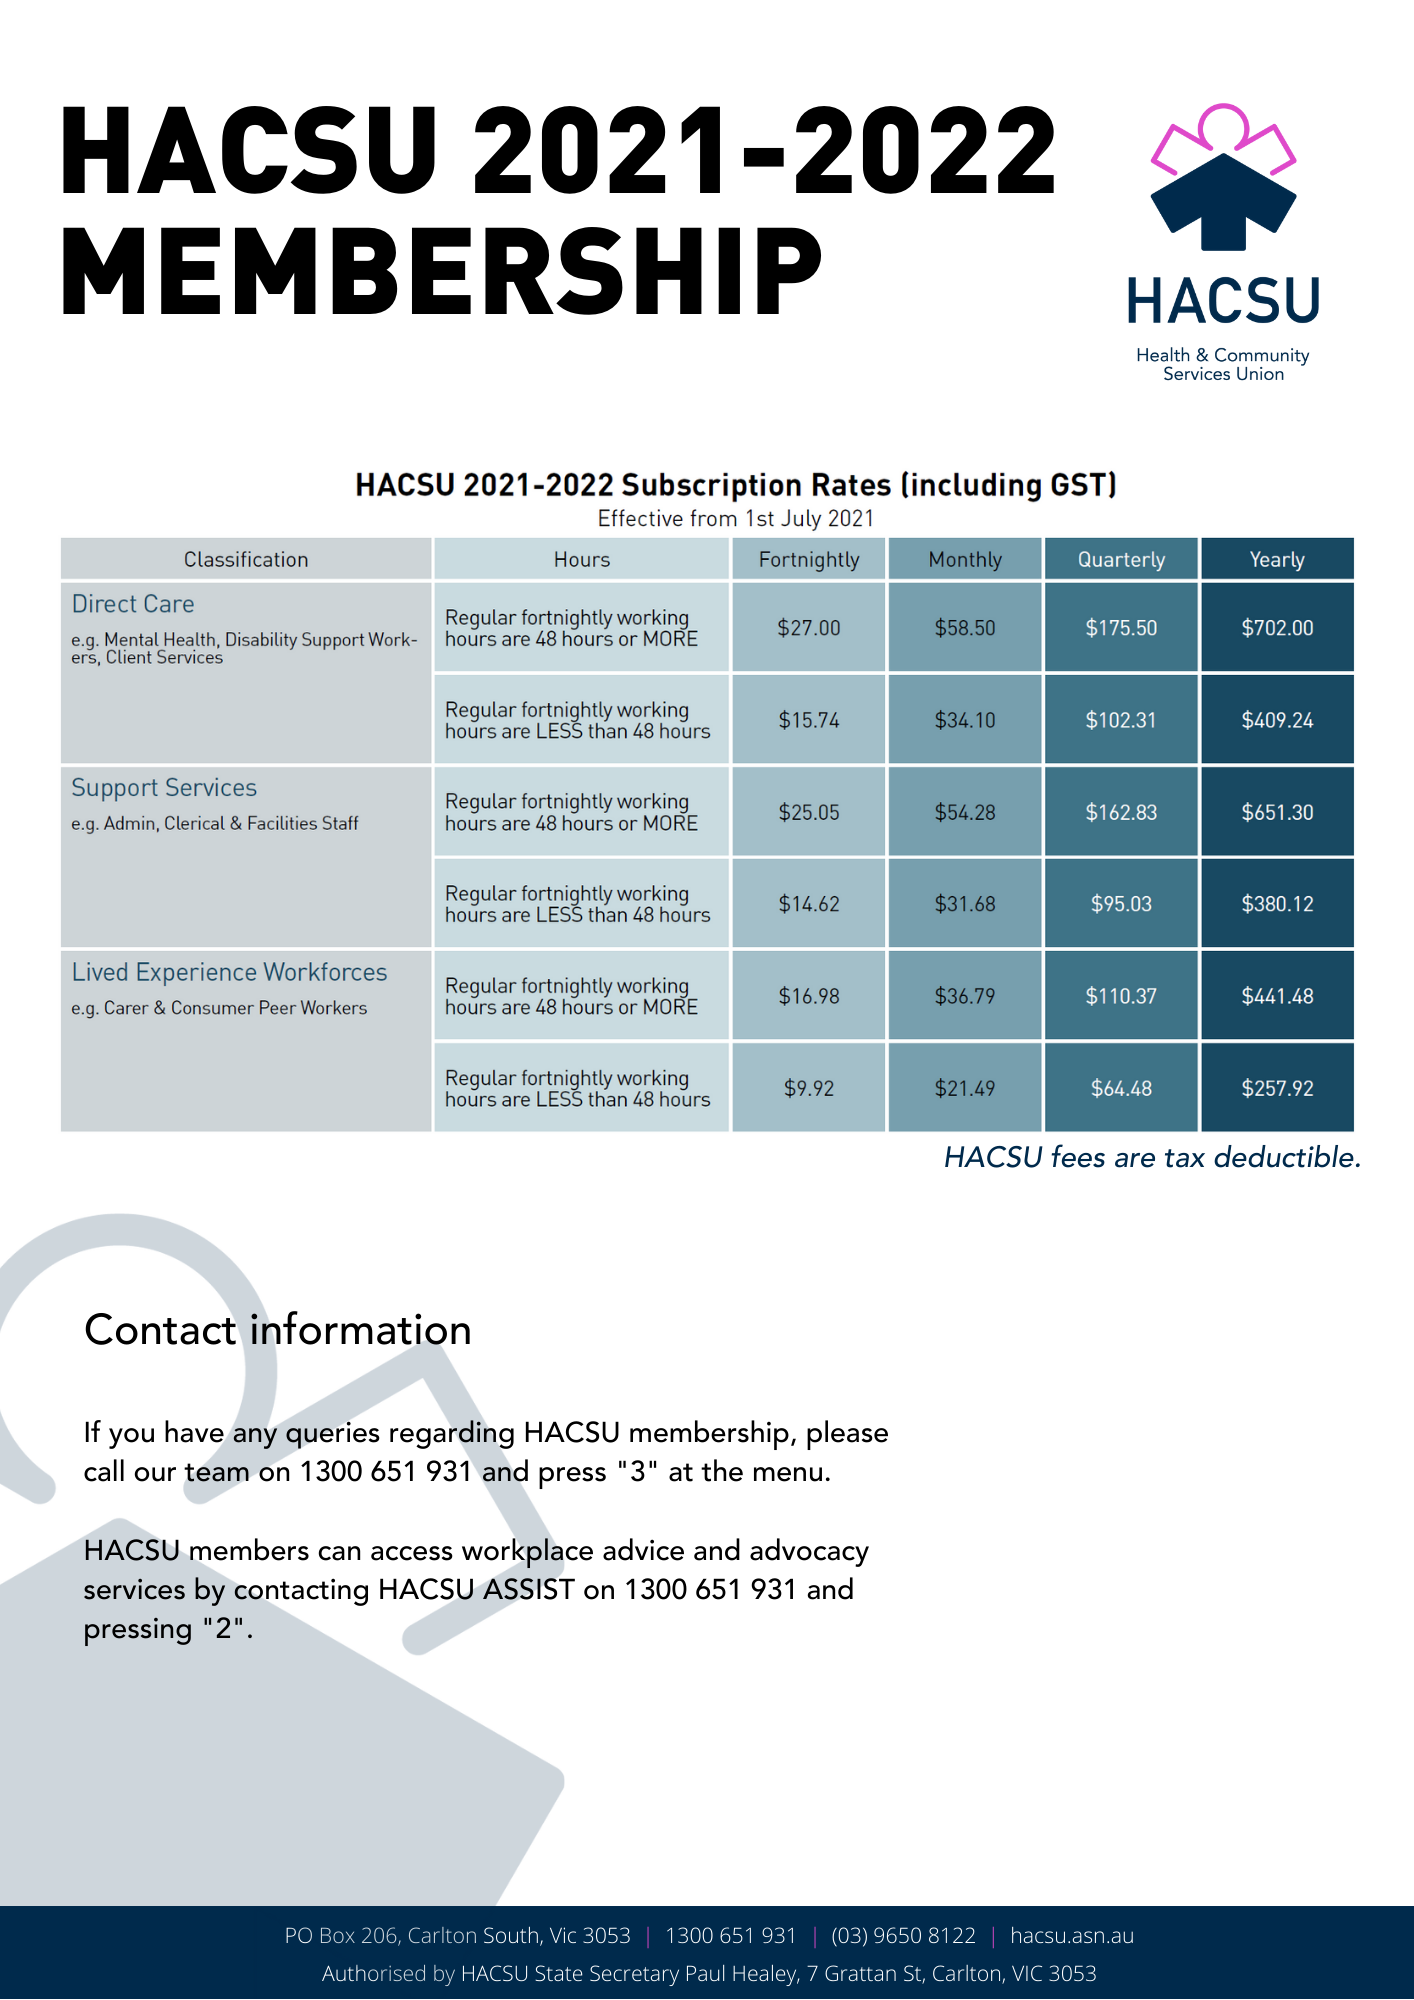 HACSU 2021-2022 Membership